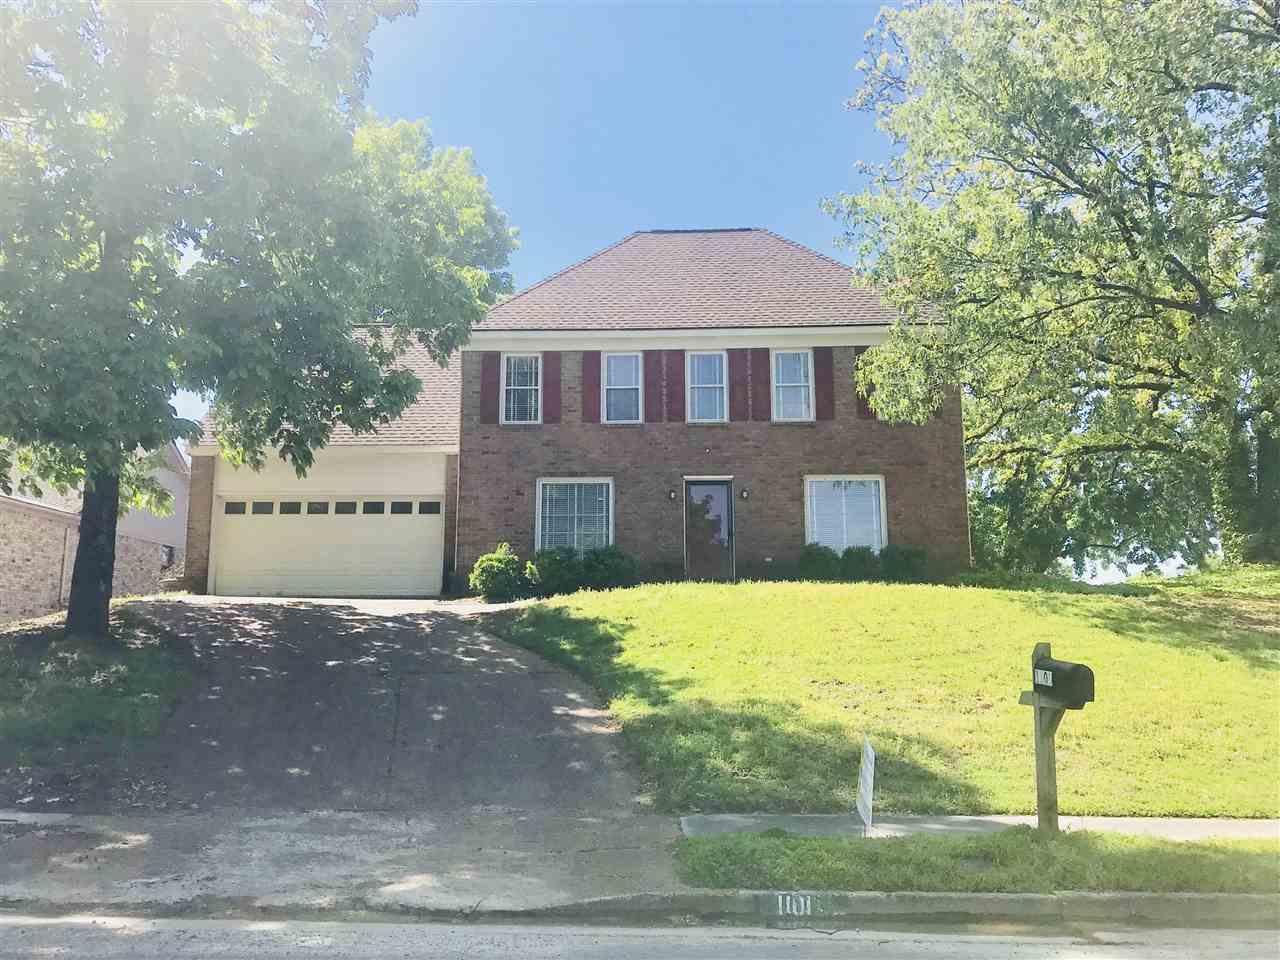 1101 Dove Hollow Memphis, TN 38018 - MLS #: 10026512